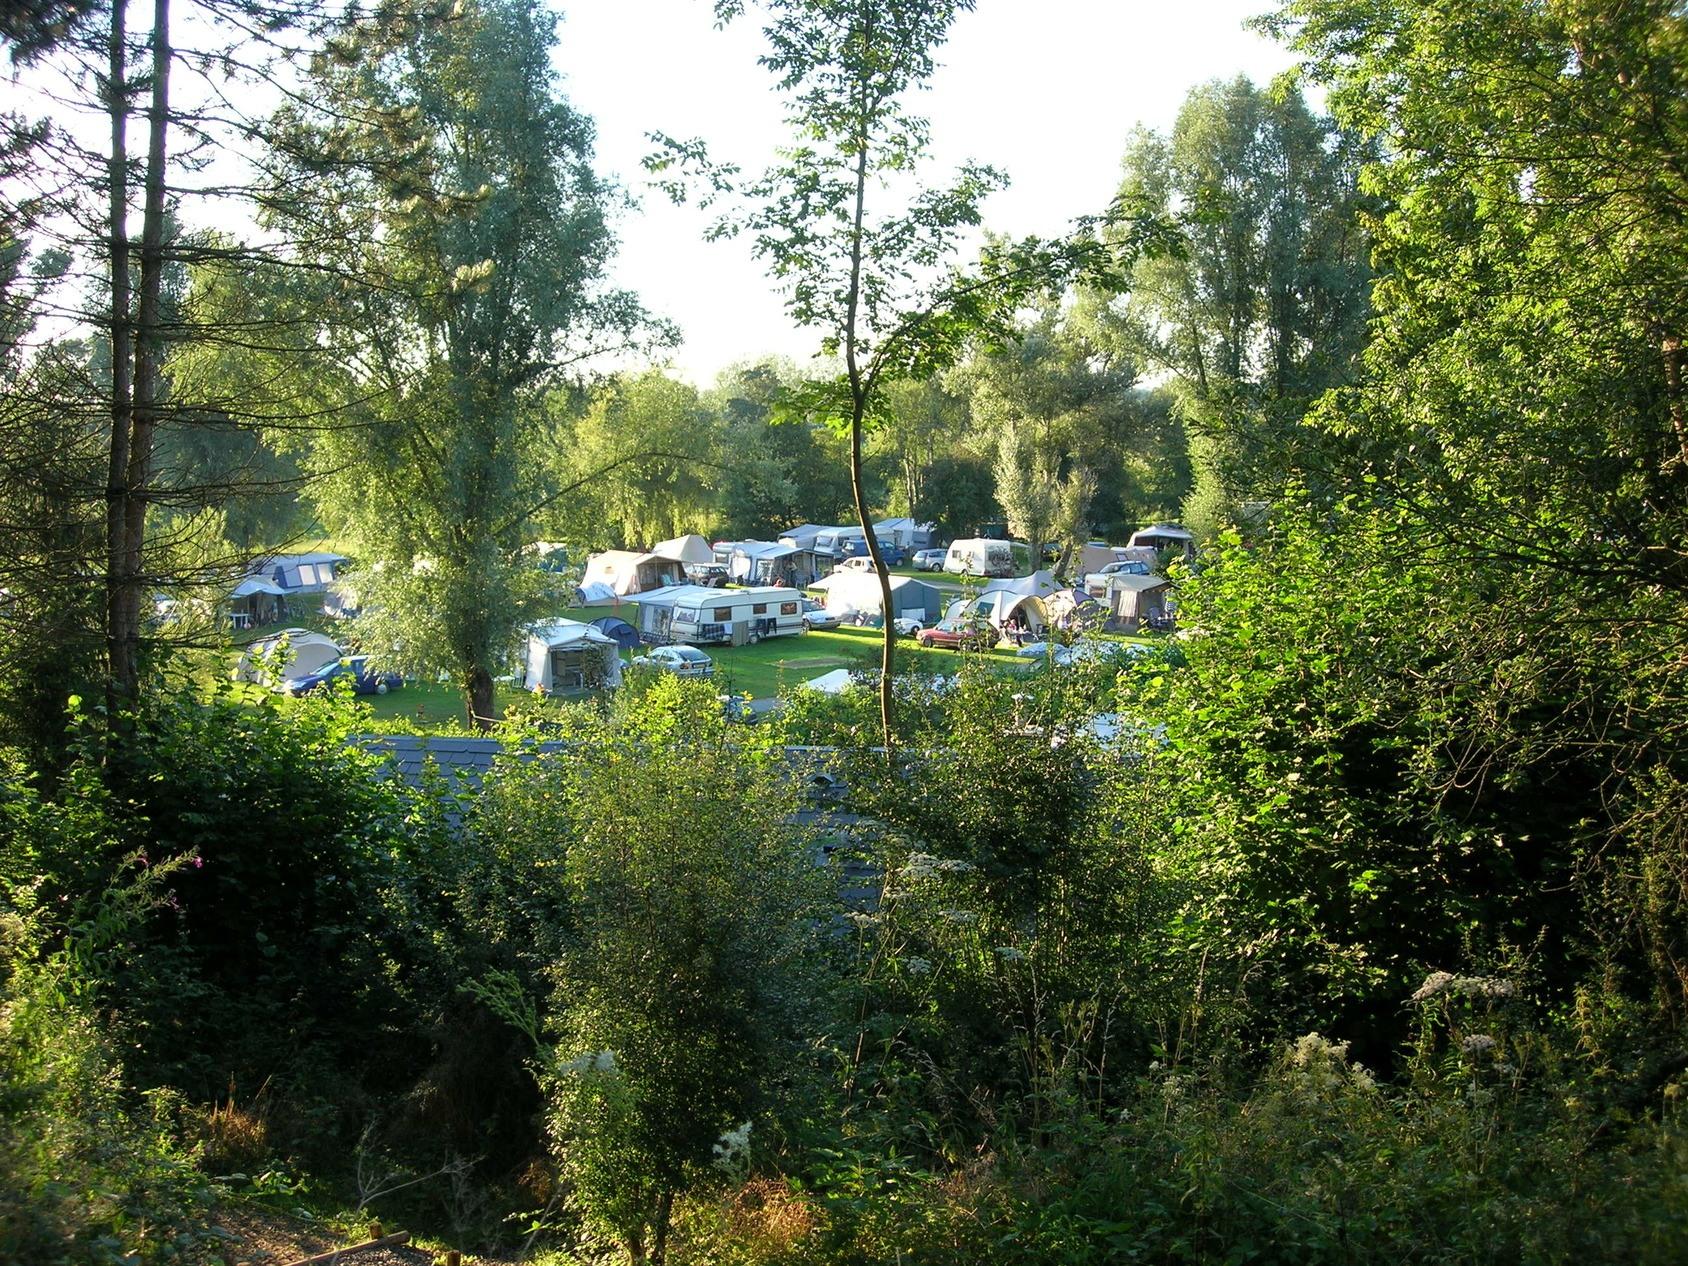 Belgie-Tintigny-Camping%20de%20Chenefleur-ExtraLarge Campings België